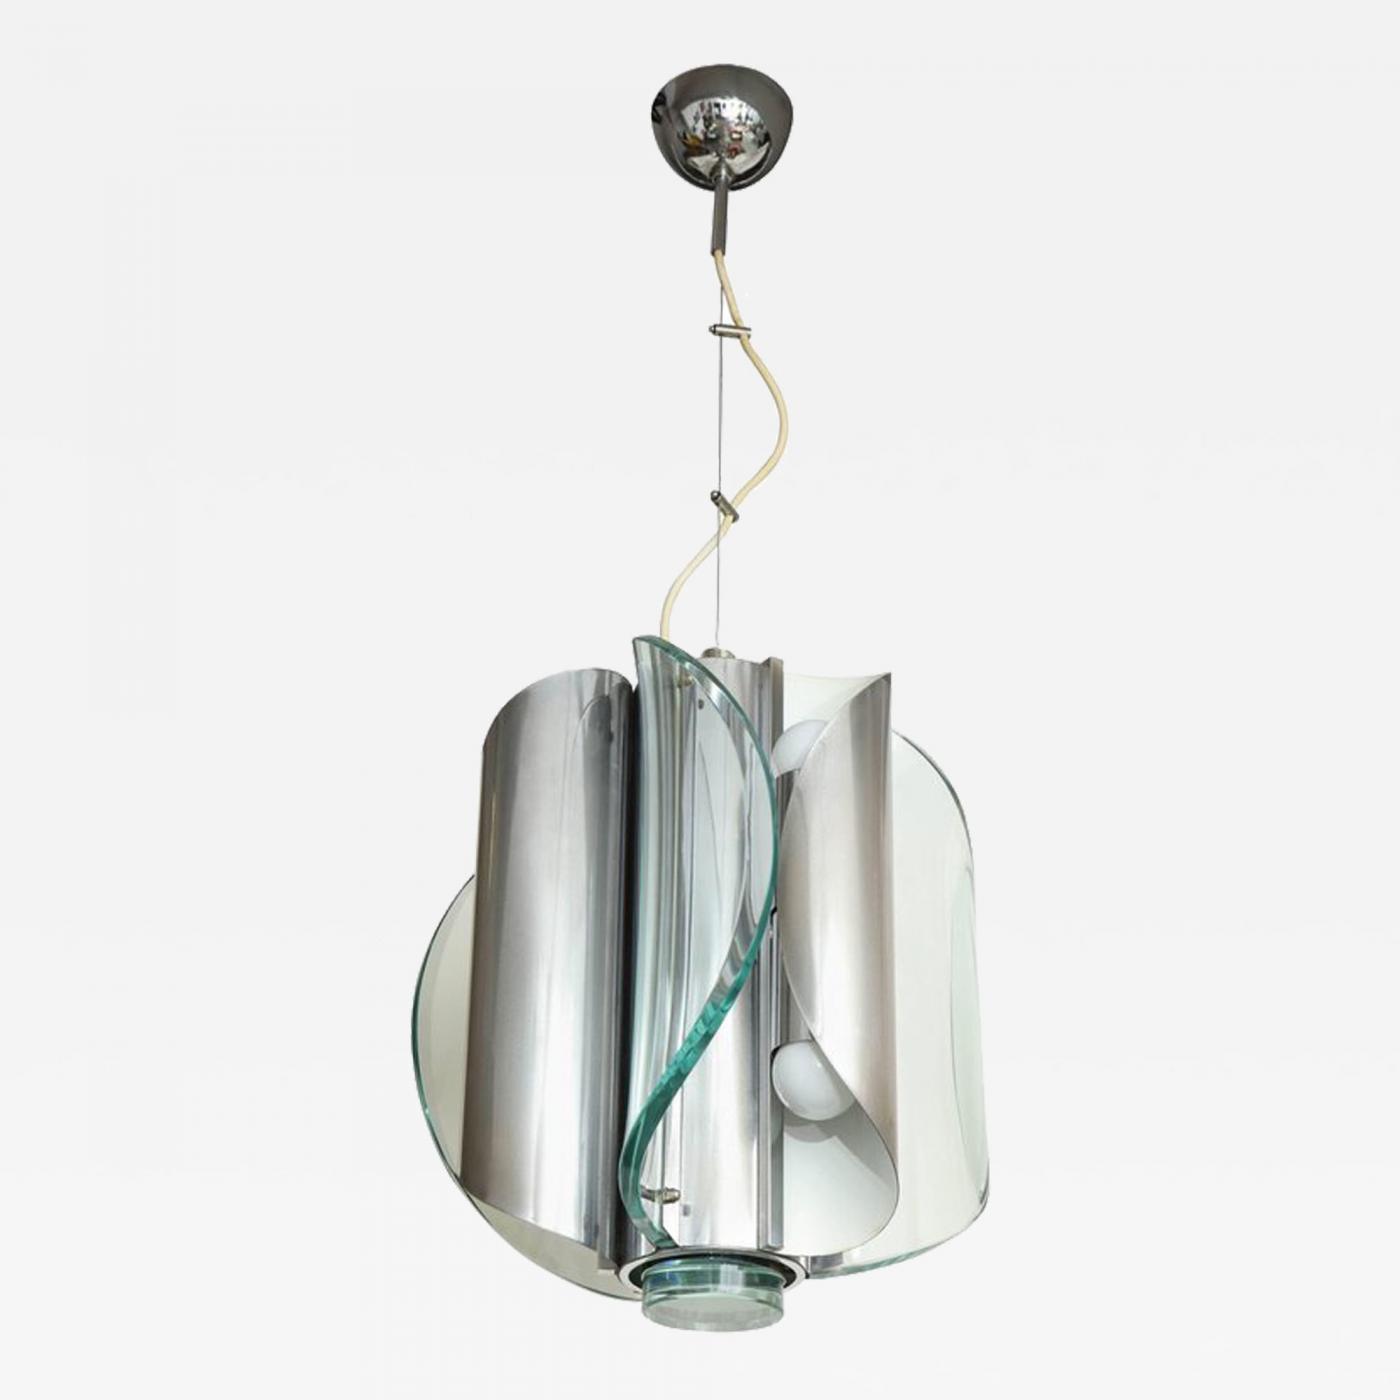 Fontana arte fontana arte chandelier made in italy in 1960s listings furniture lighting chandeliers and pendants fontana arte aloadofball Images